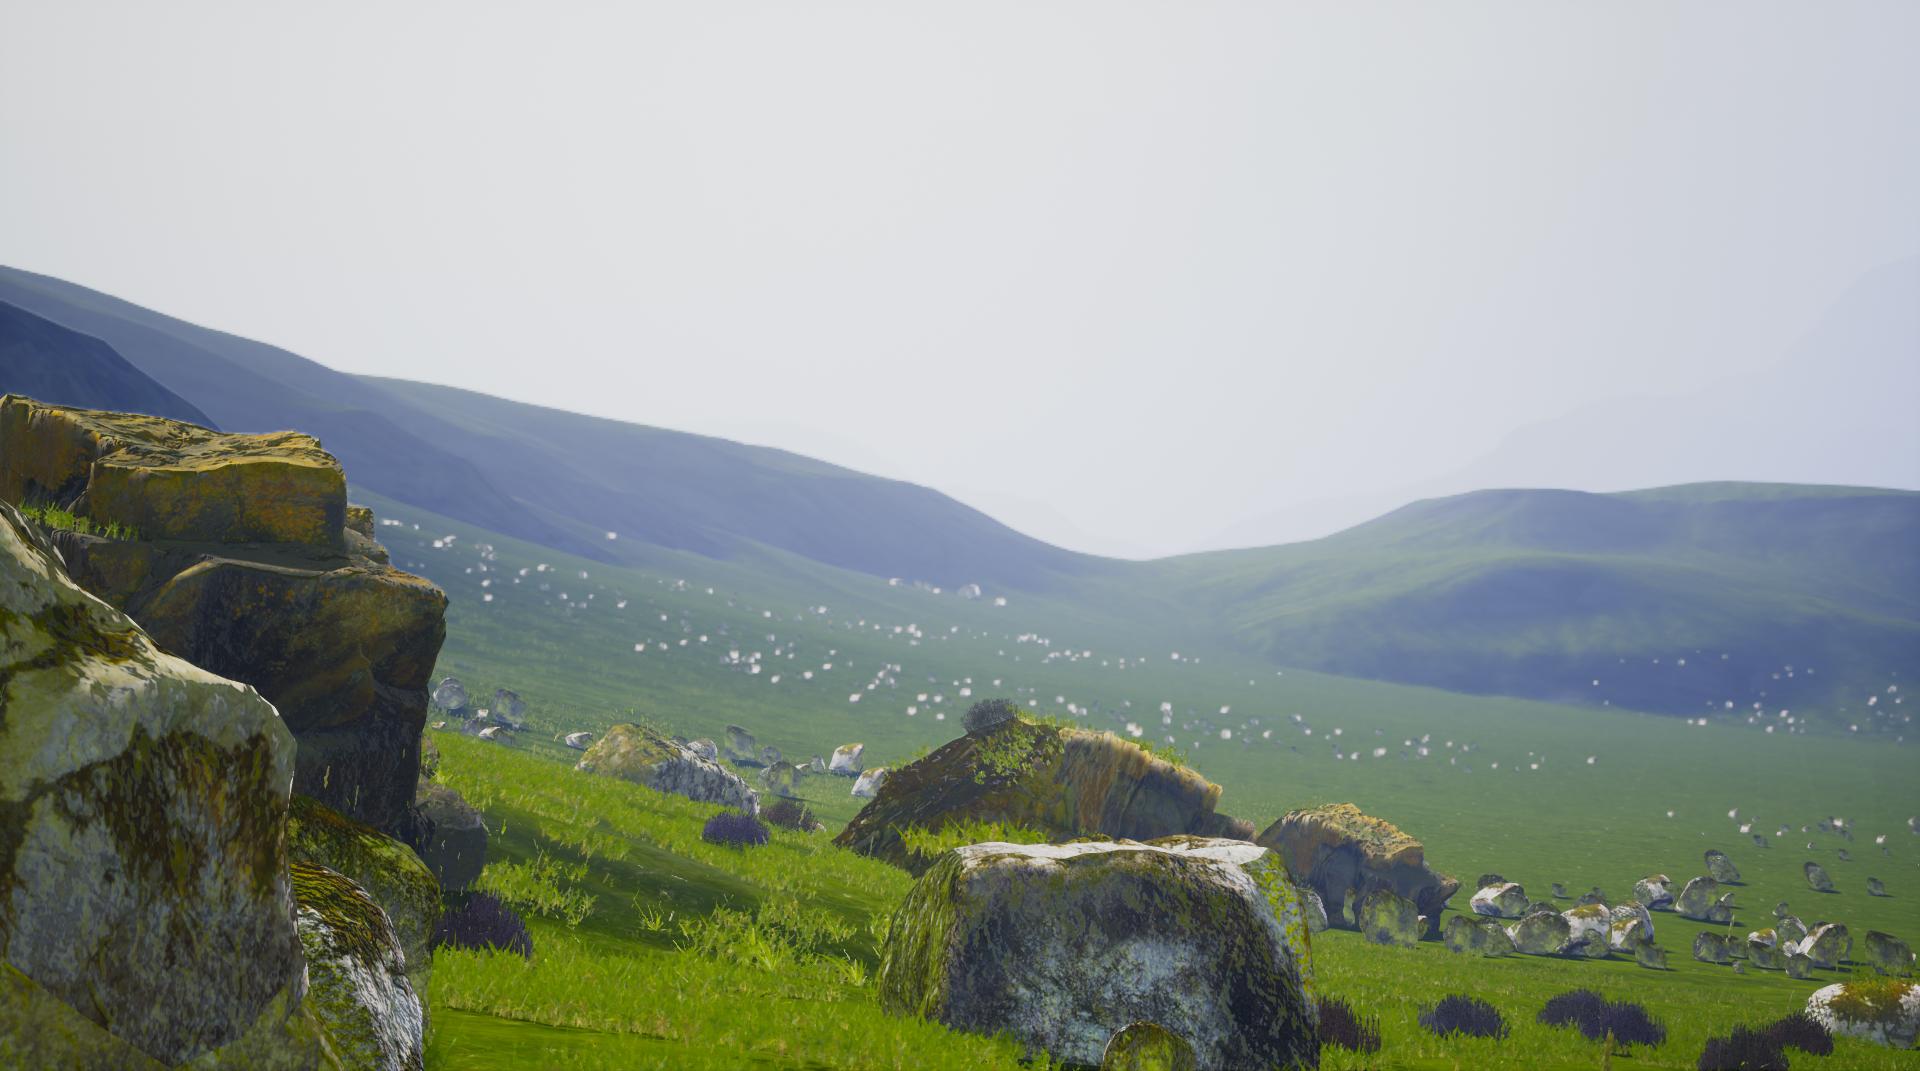 Quixel Megascans environment render